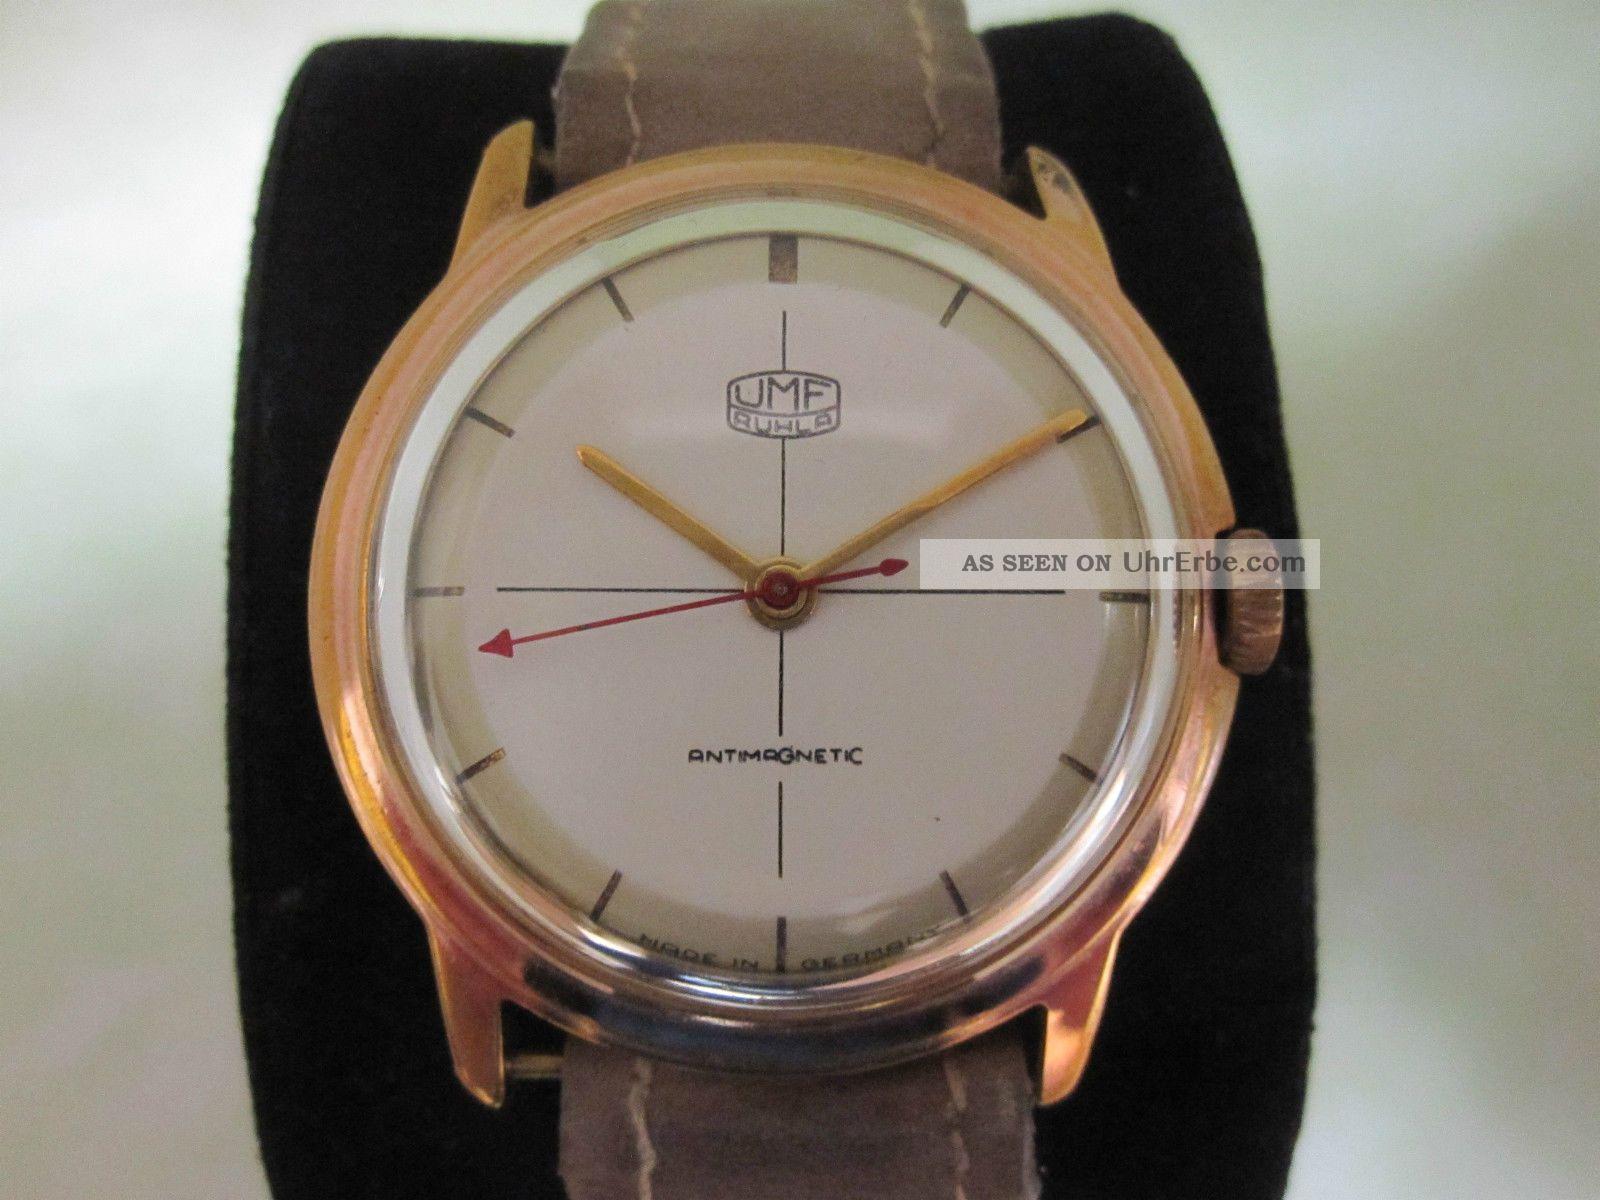 Goldene Ruhla Umf 23 Hau Ddr Funktioniert Handaufzug Armbanduhren Bild